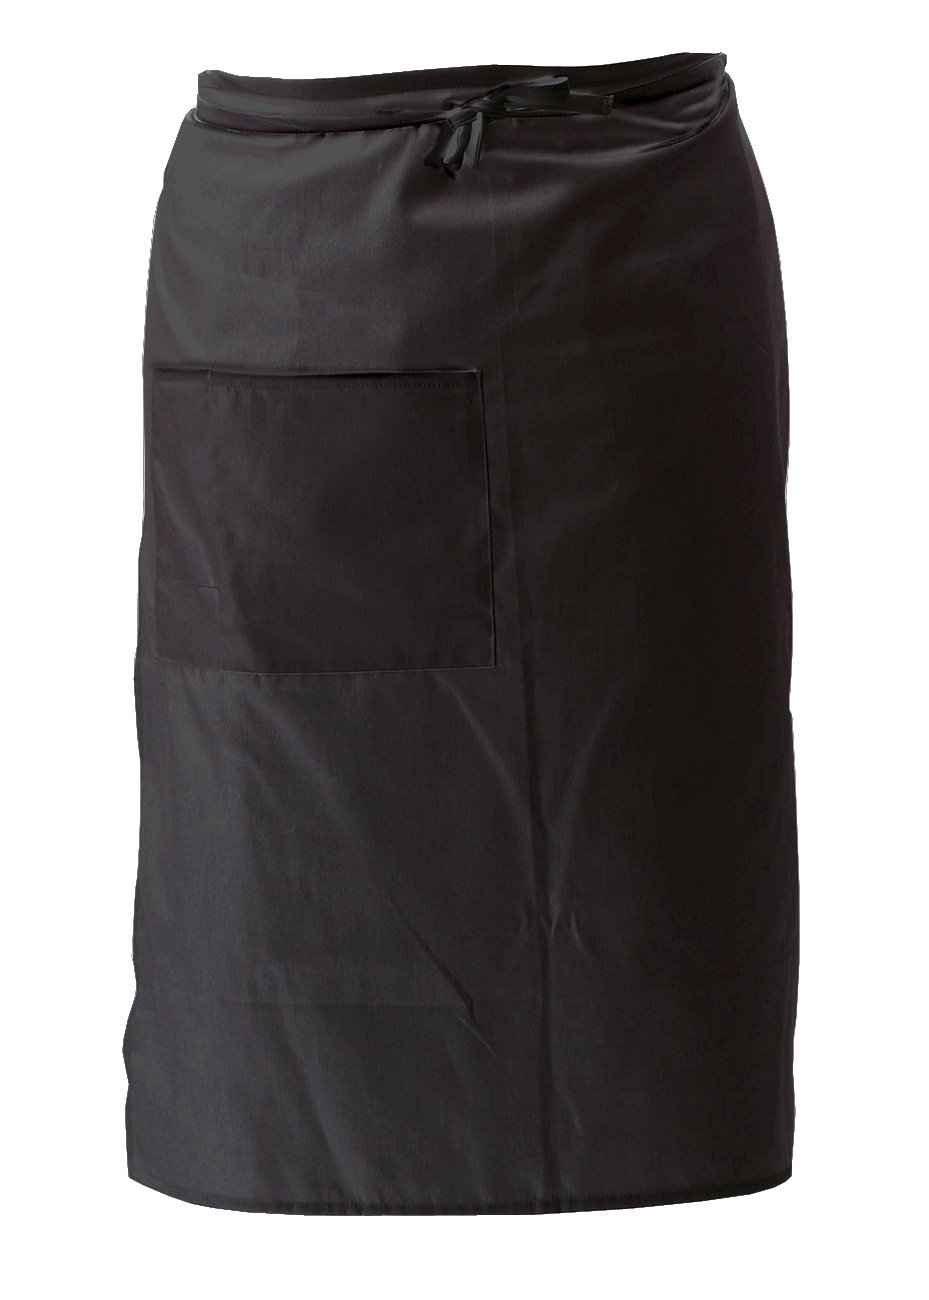 Crestware Bistro Apron 2 Pocket, Black